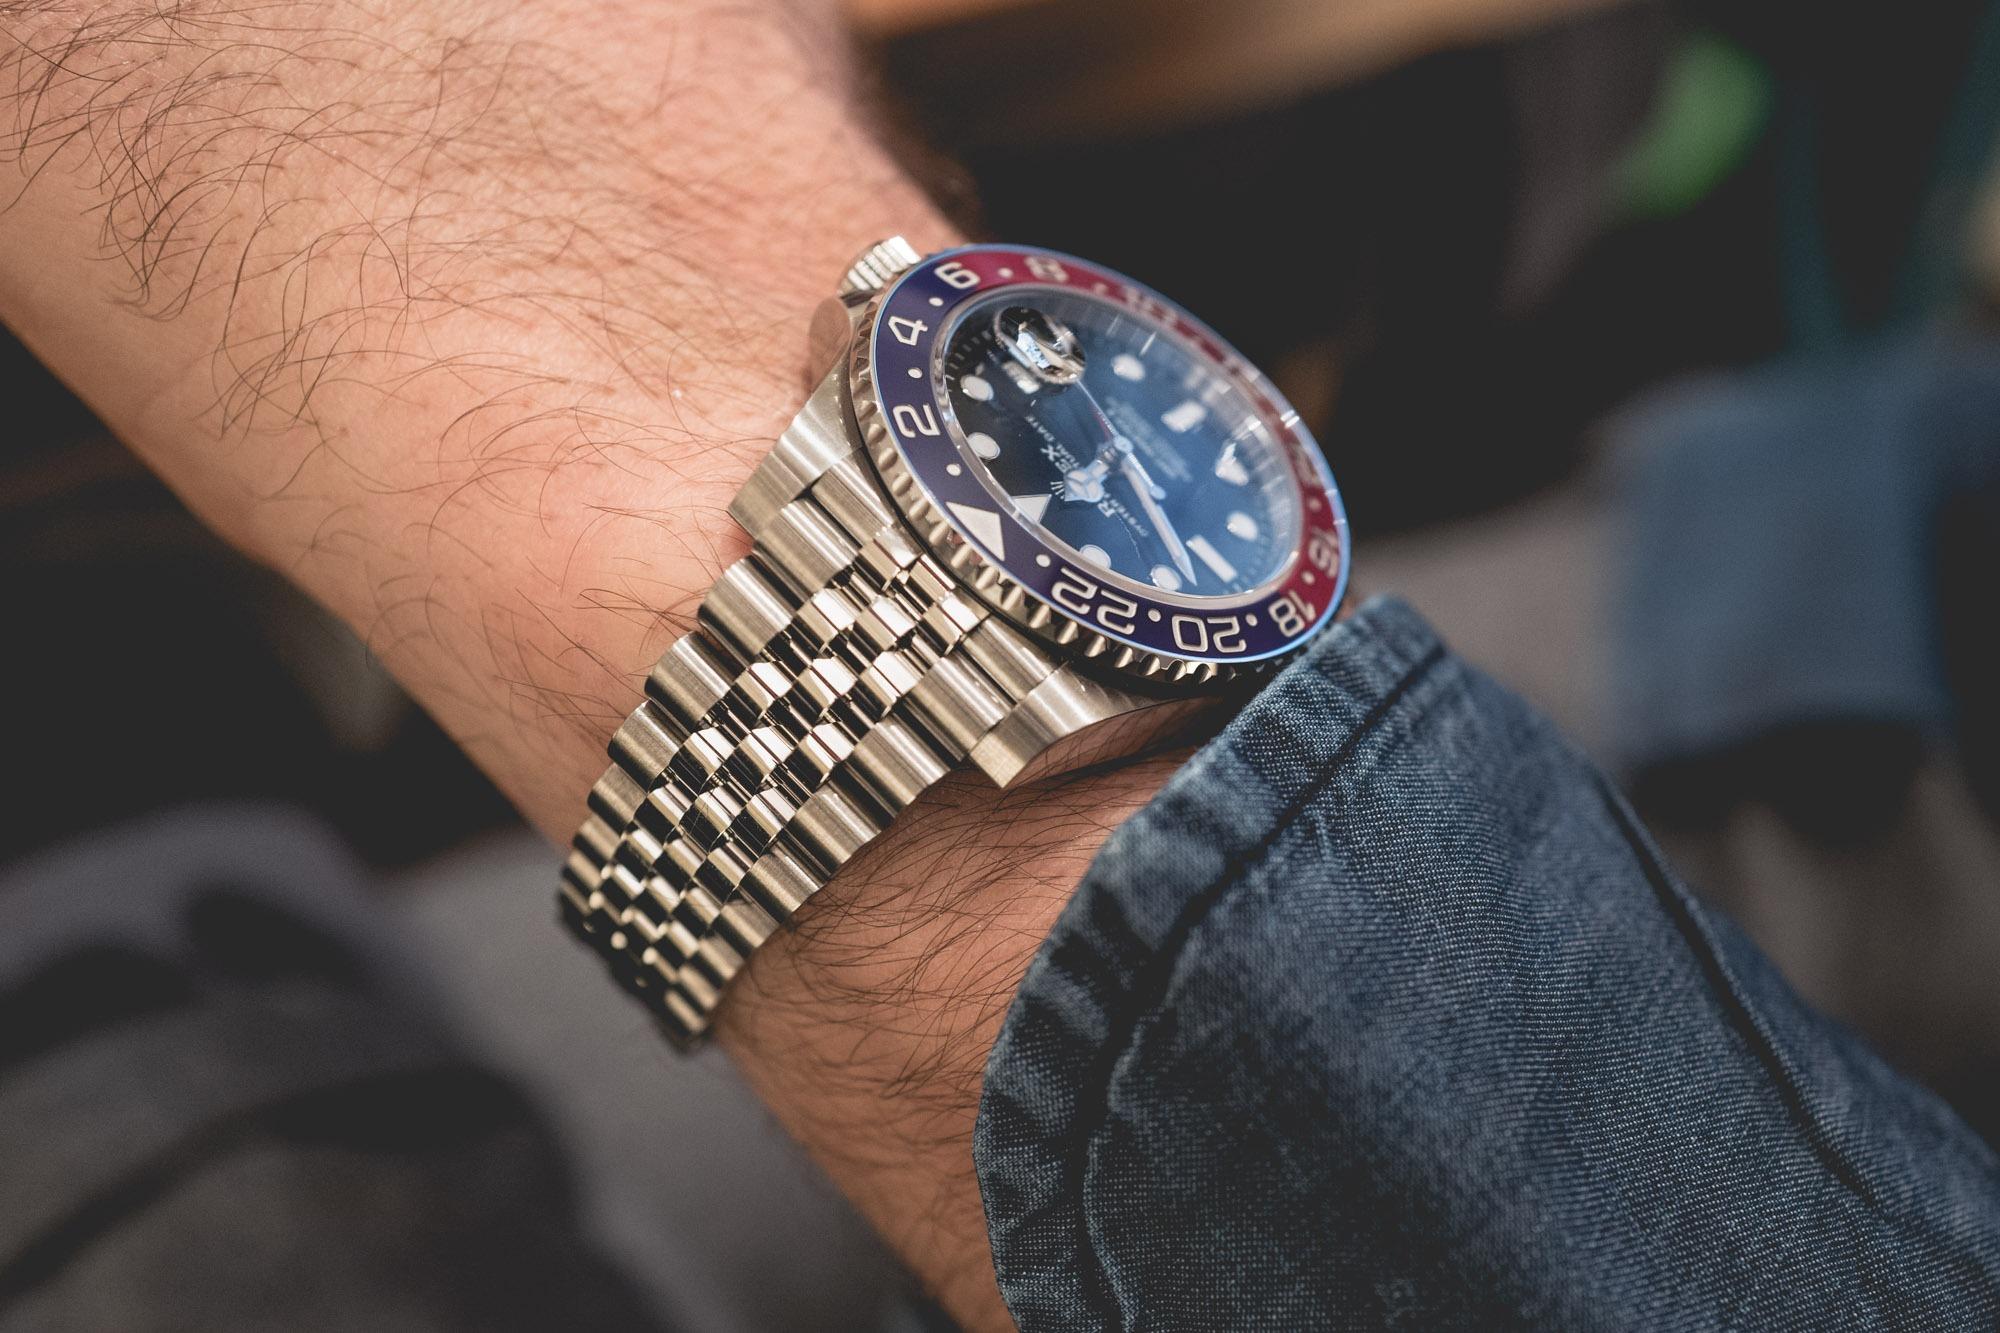 Baselworld 2018 - Rolex GMT-Master II 'Pepsi' - Bracelet Jubilee